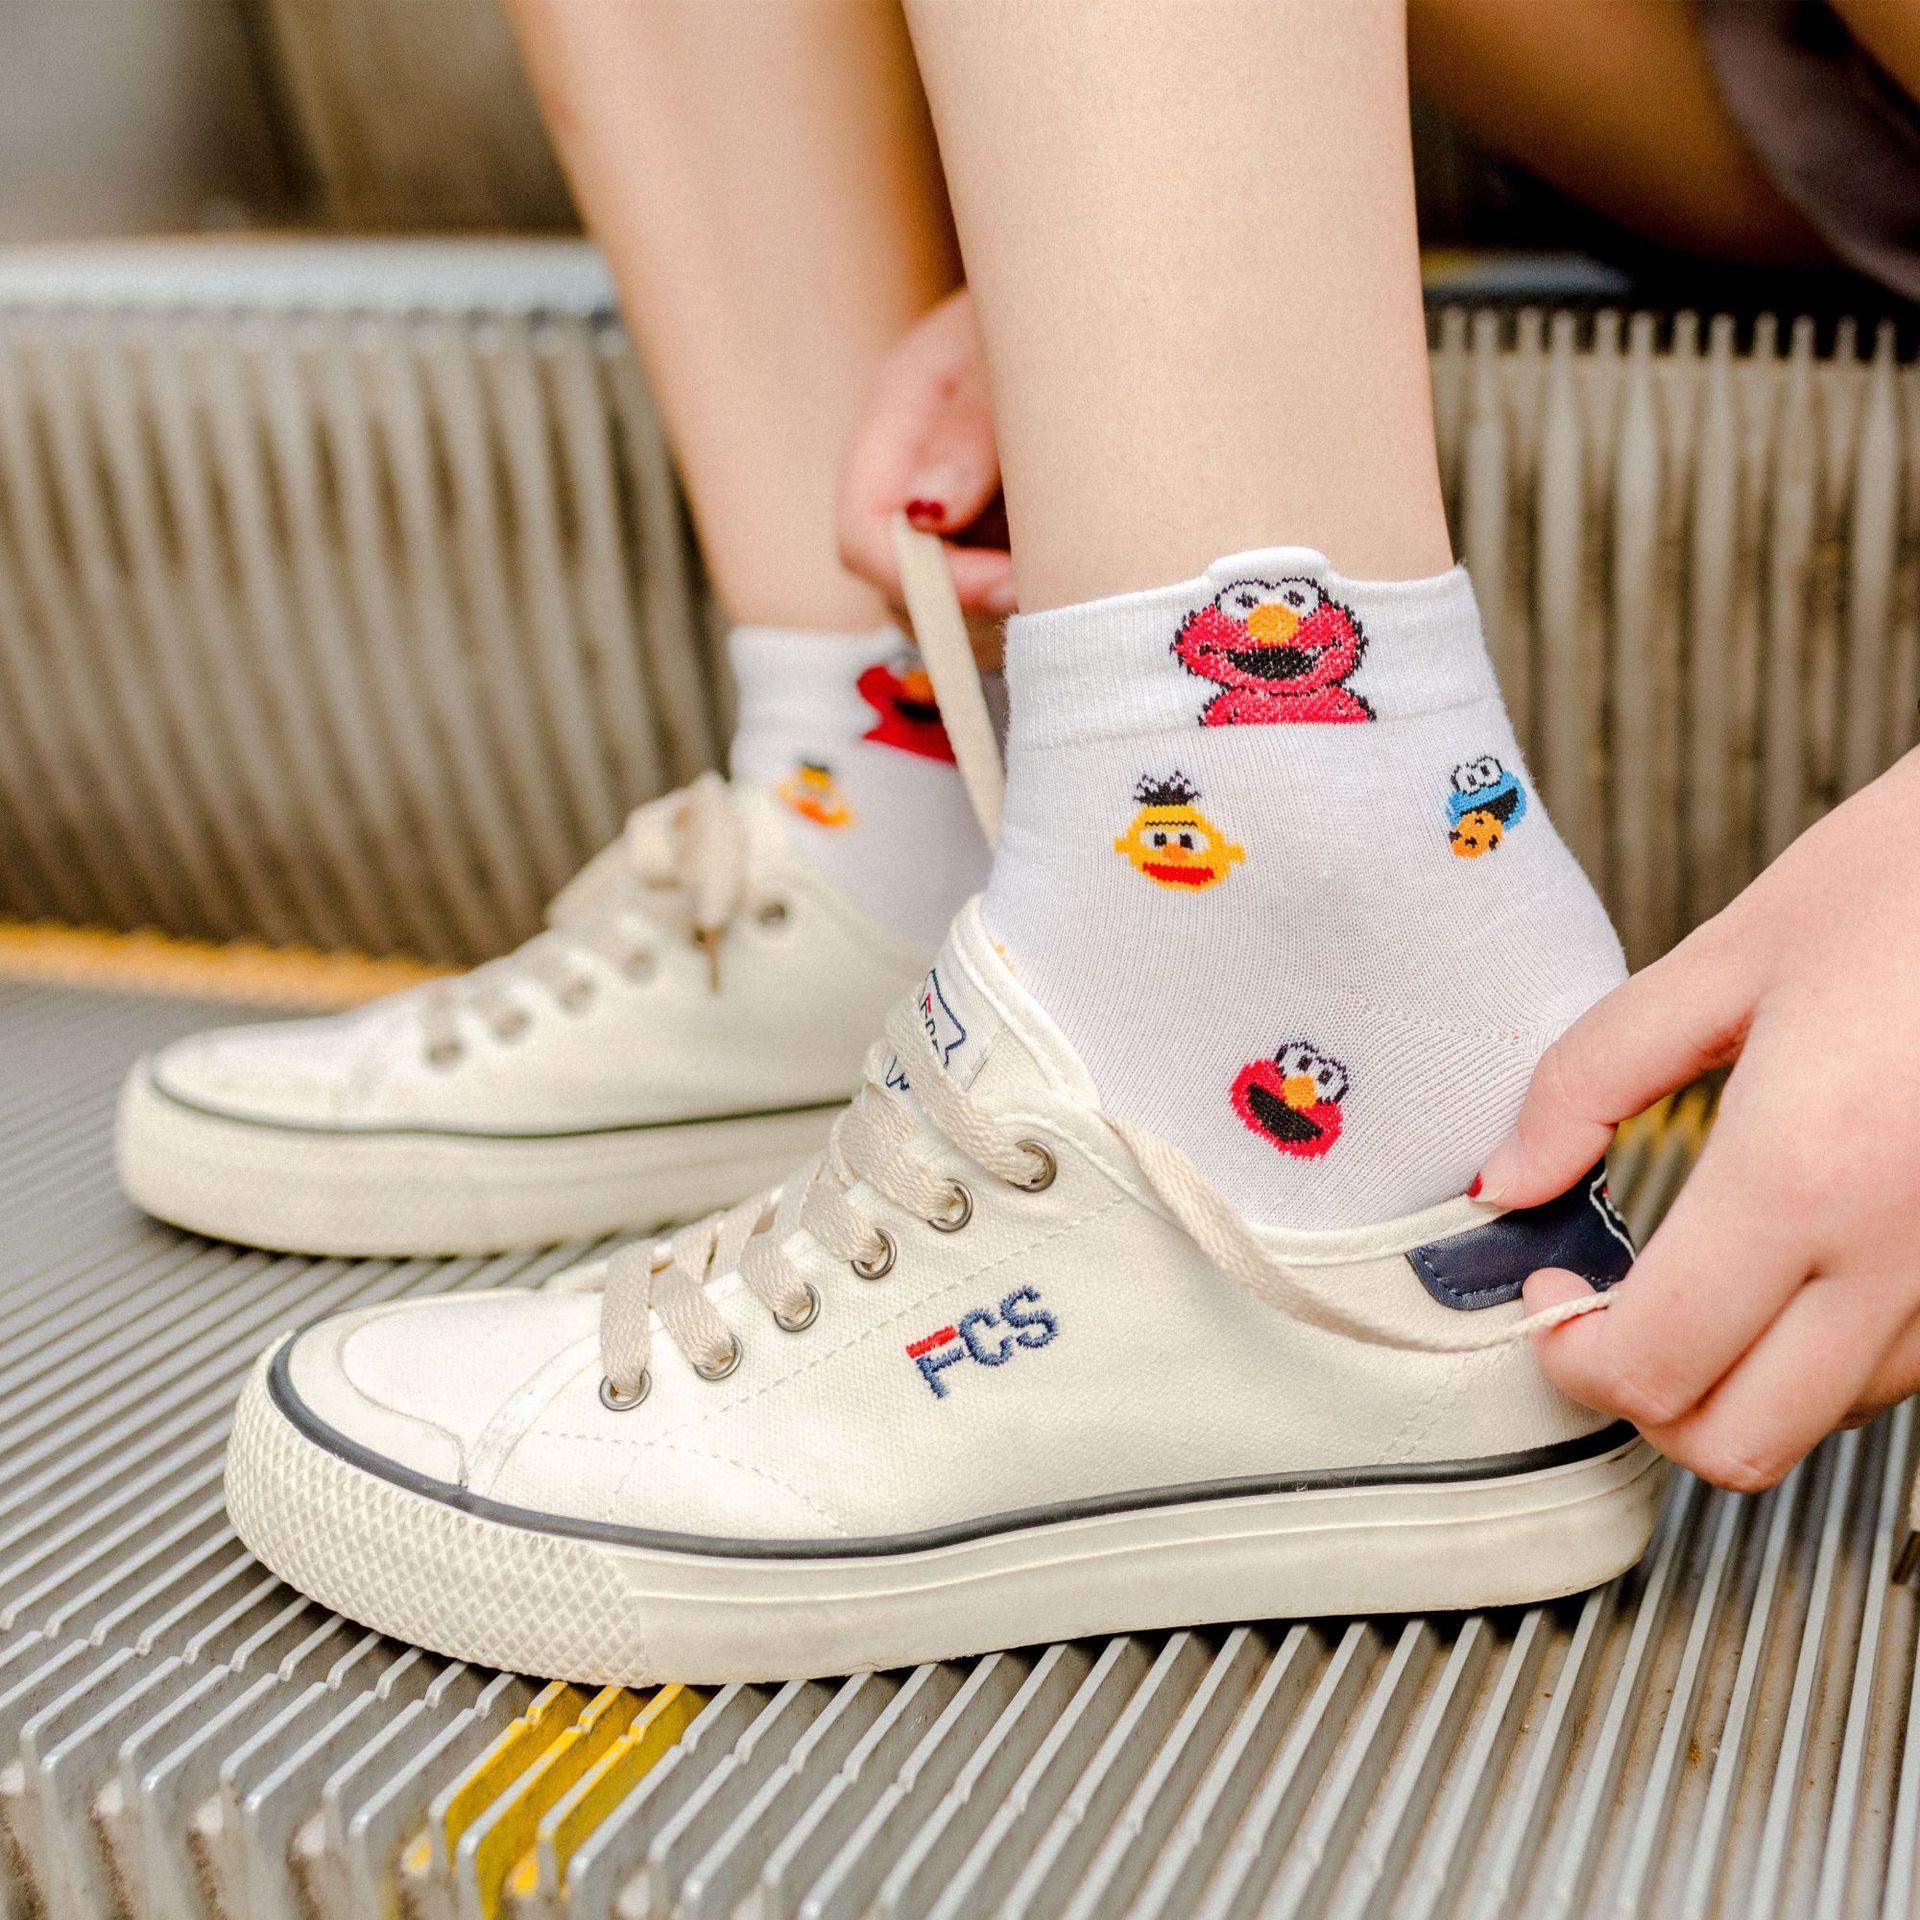 Cute Cartoon Sesame Street   Socks   Elmo Cookie Monster Fashion Novelty Funny Women   Sock   Autumn Comfortable Breathable Cotton   Socks